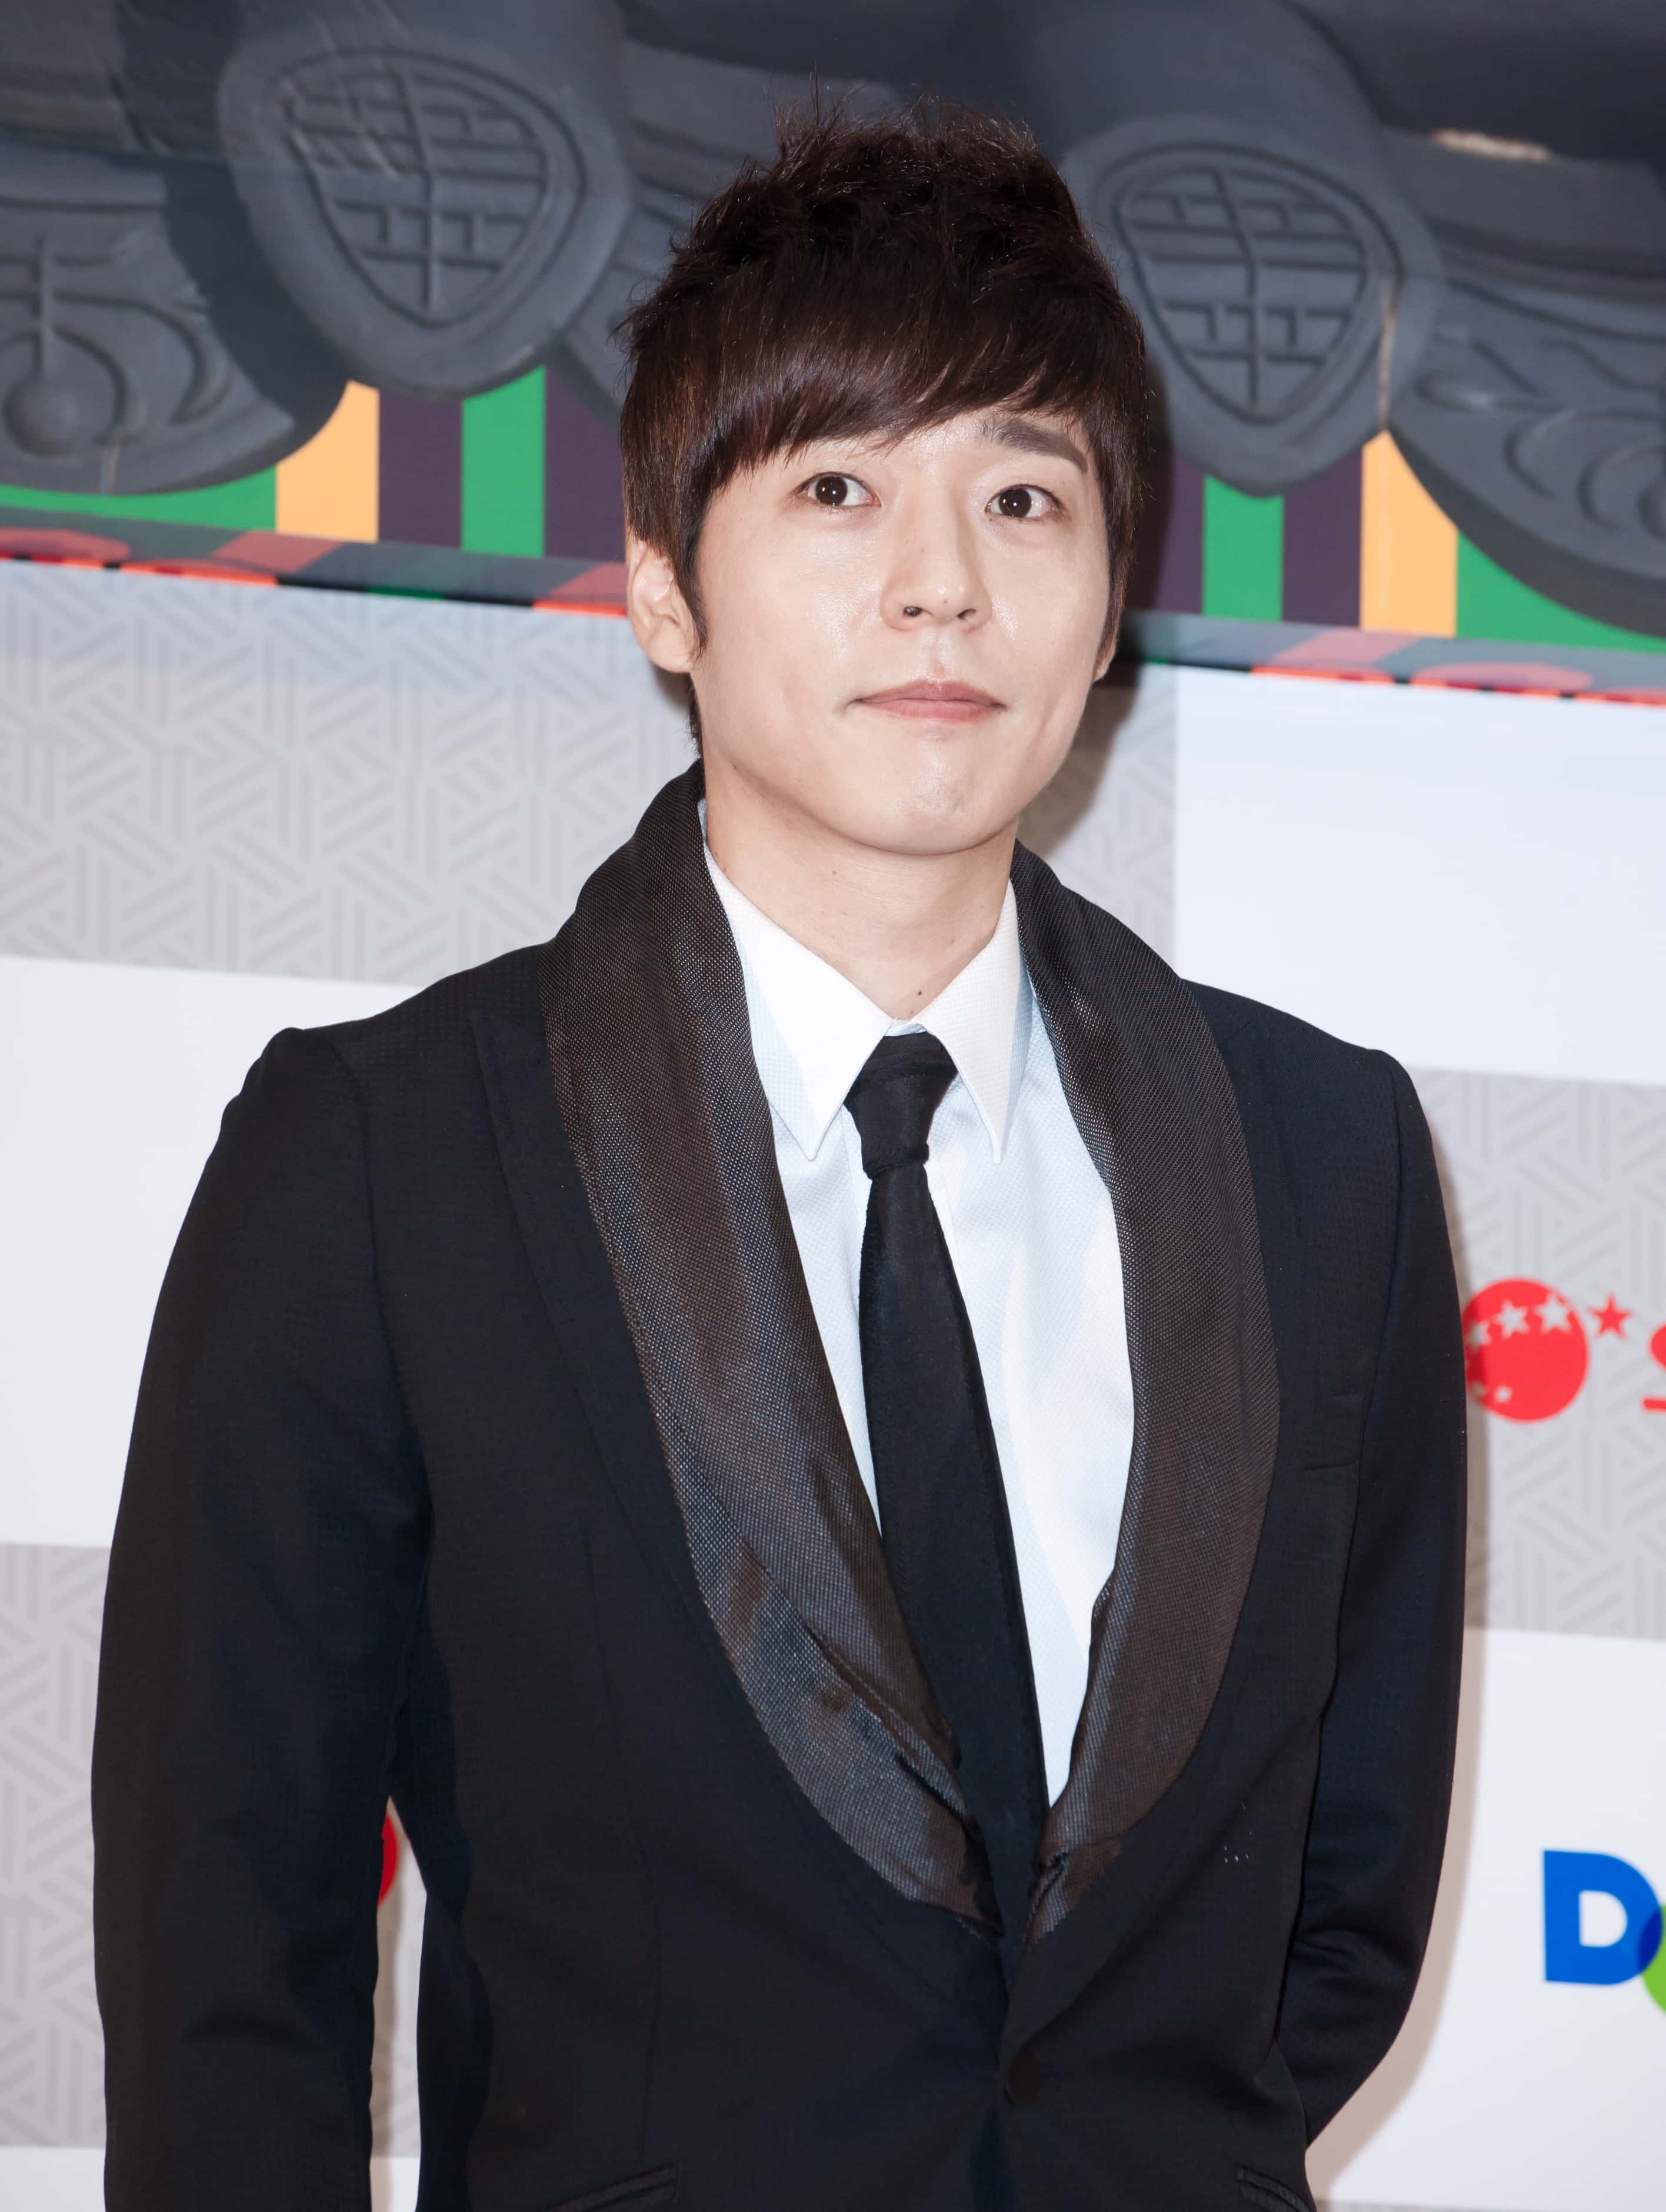 Kang Ji-hwan admits sexual assault, apologizes to victims